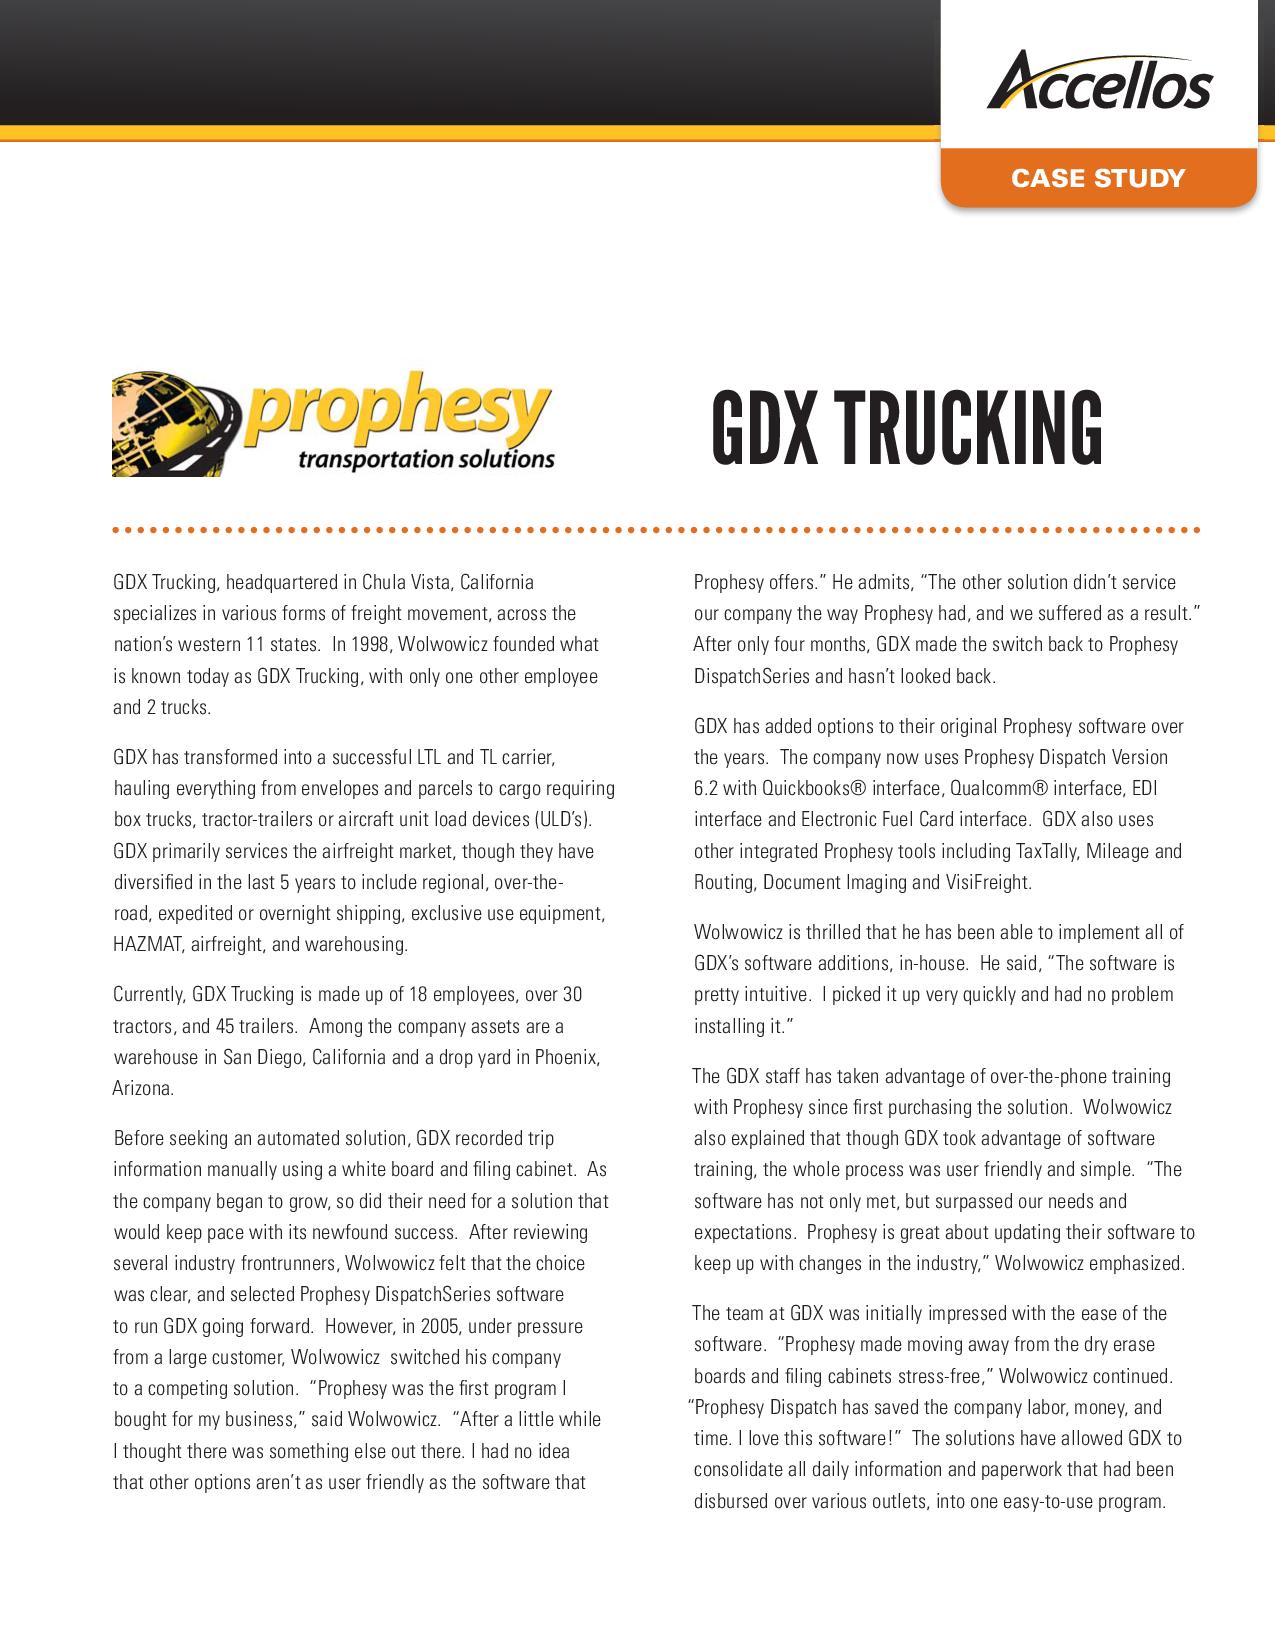 GDX Trucking